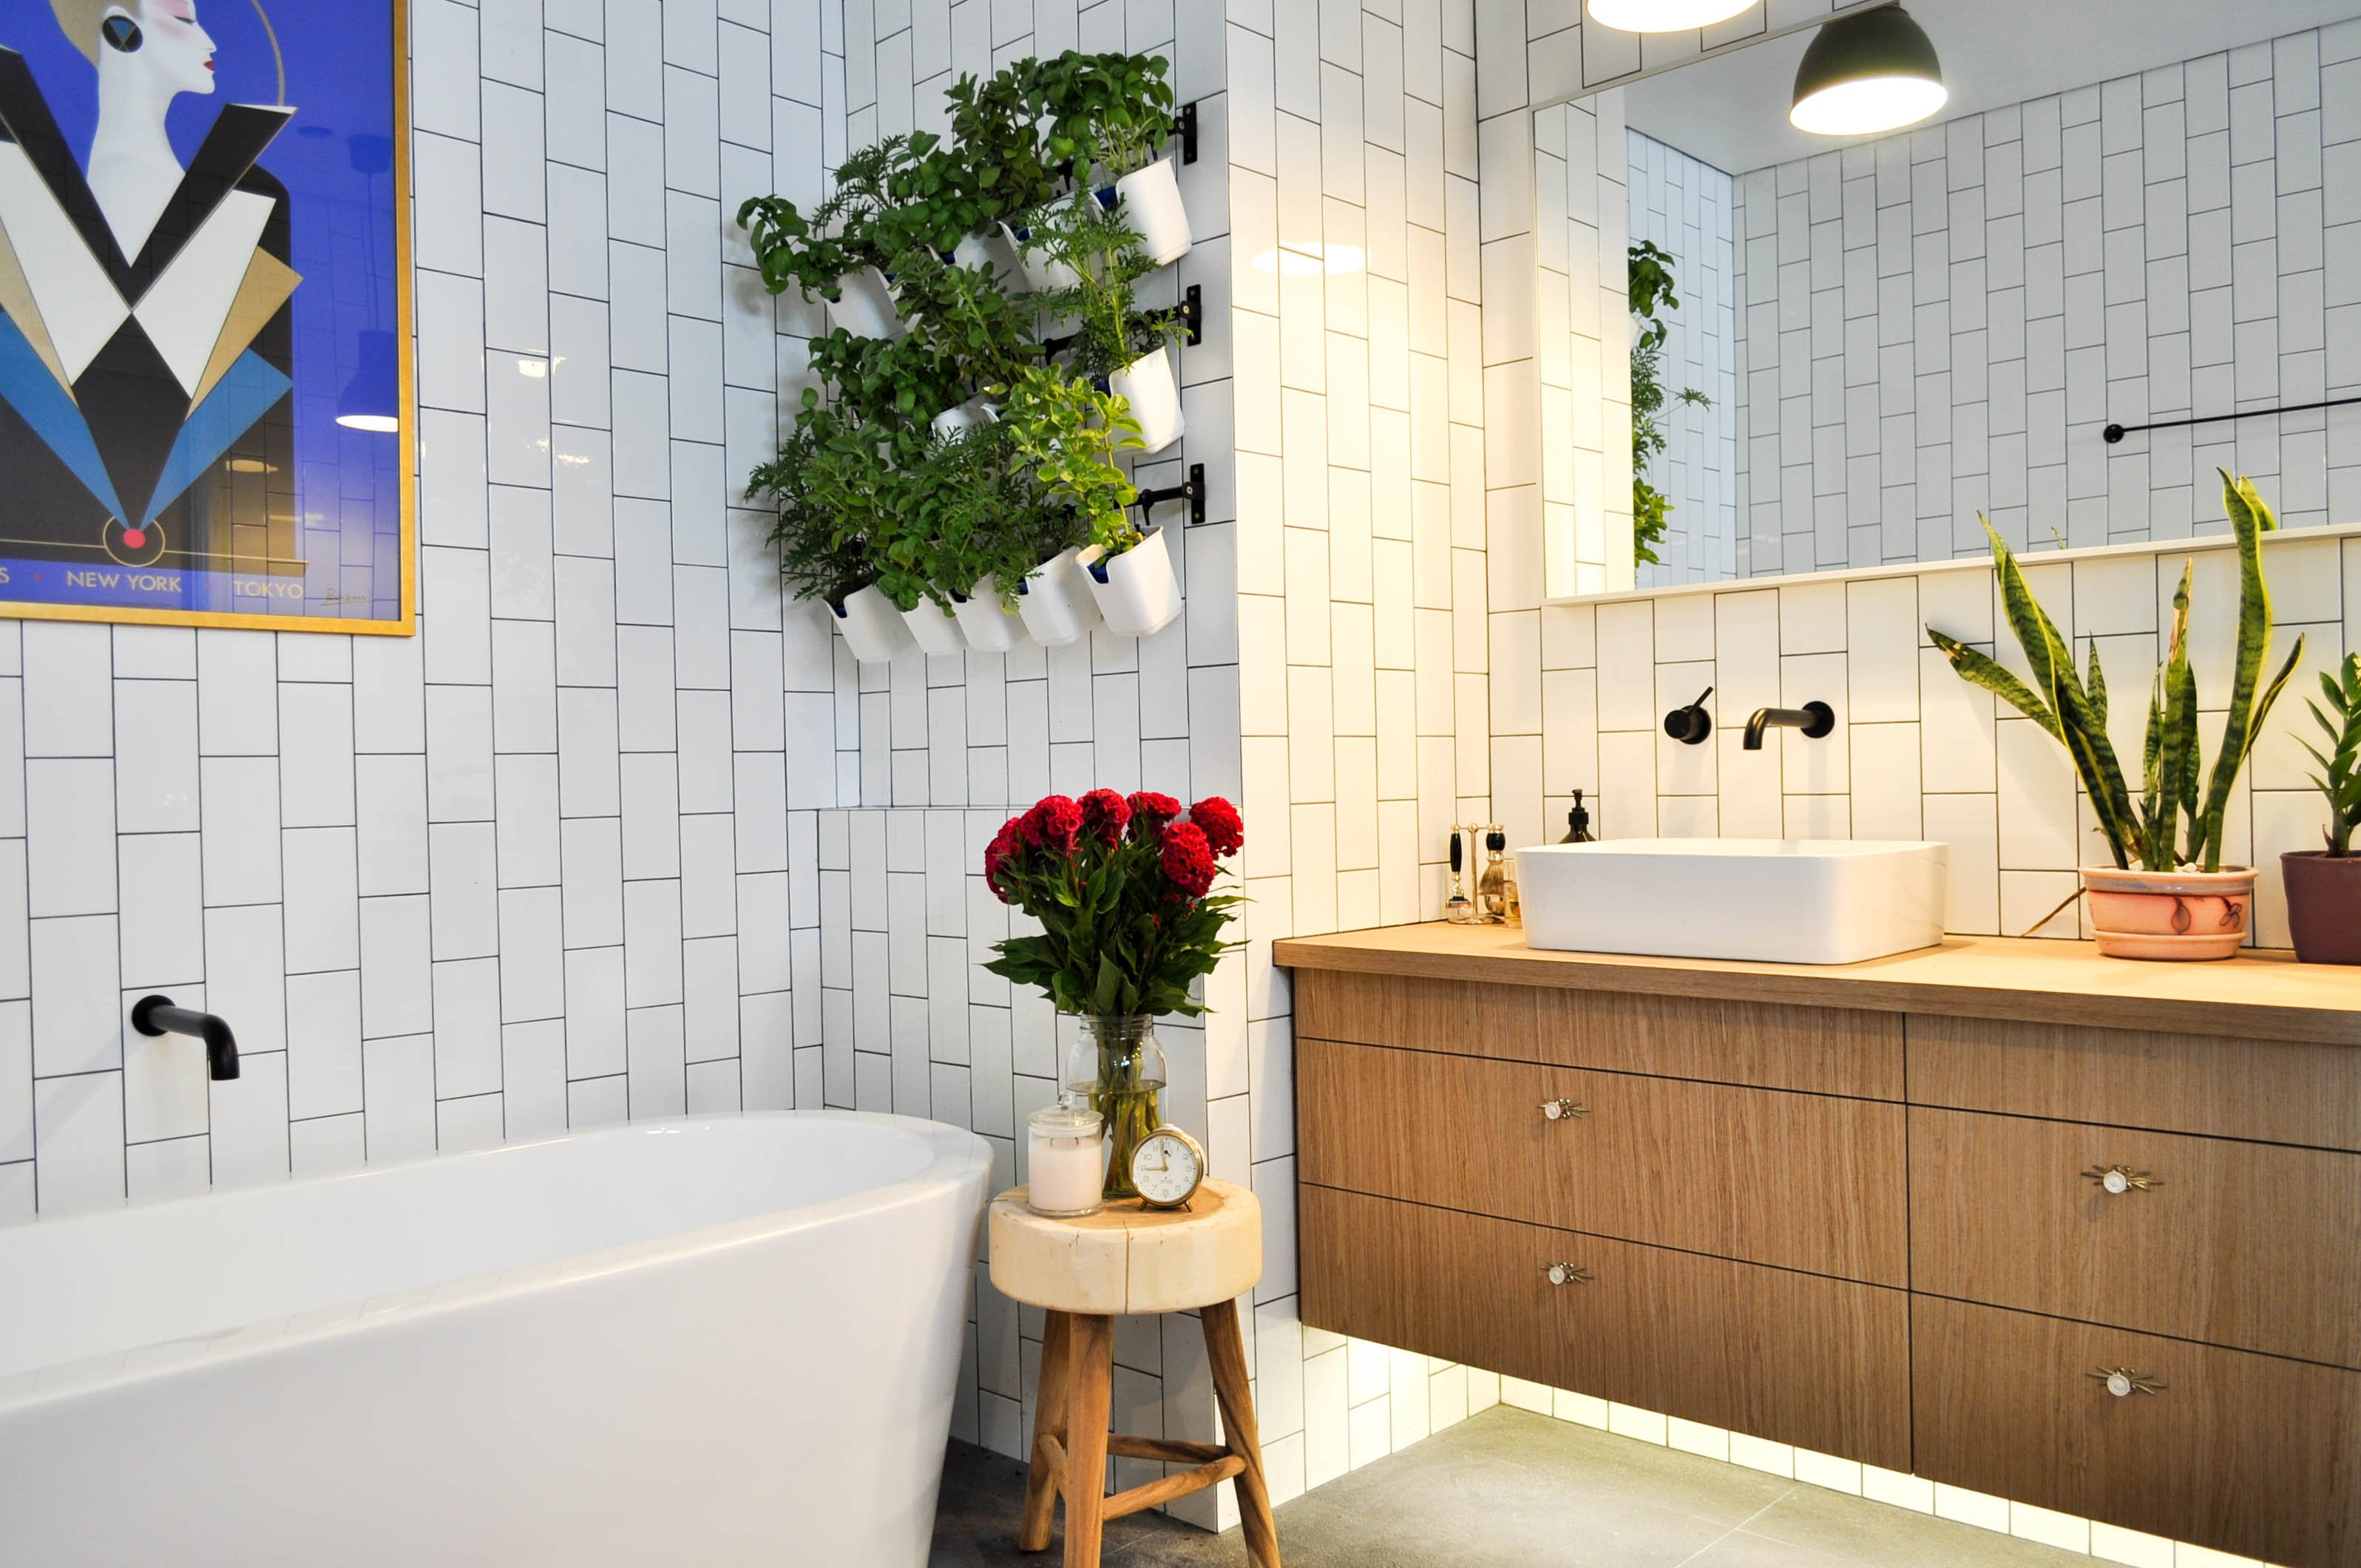 6 How to Makeover Your Bathroom For Under 100 VIA SIMPHOME